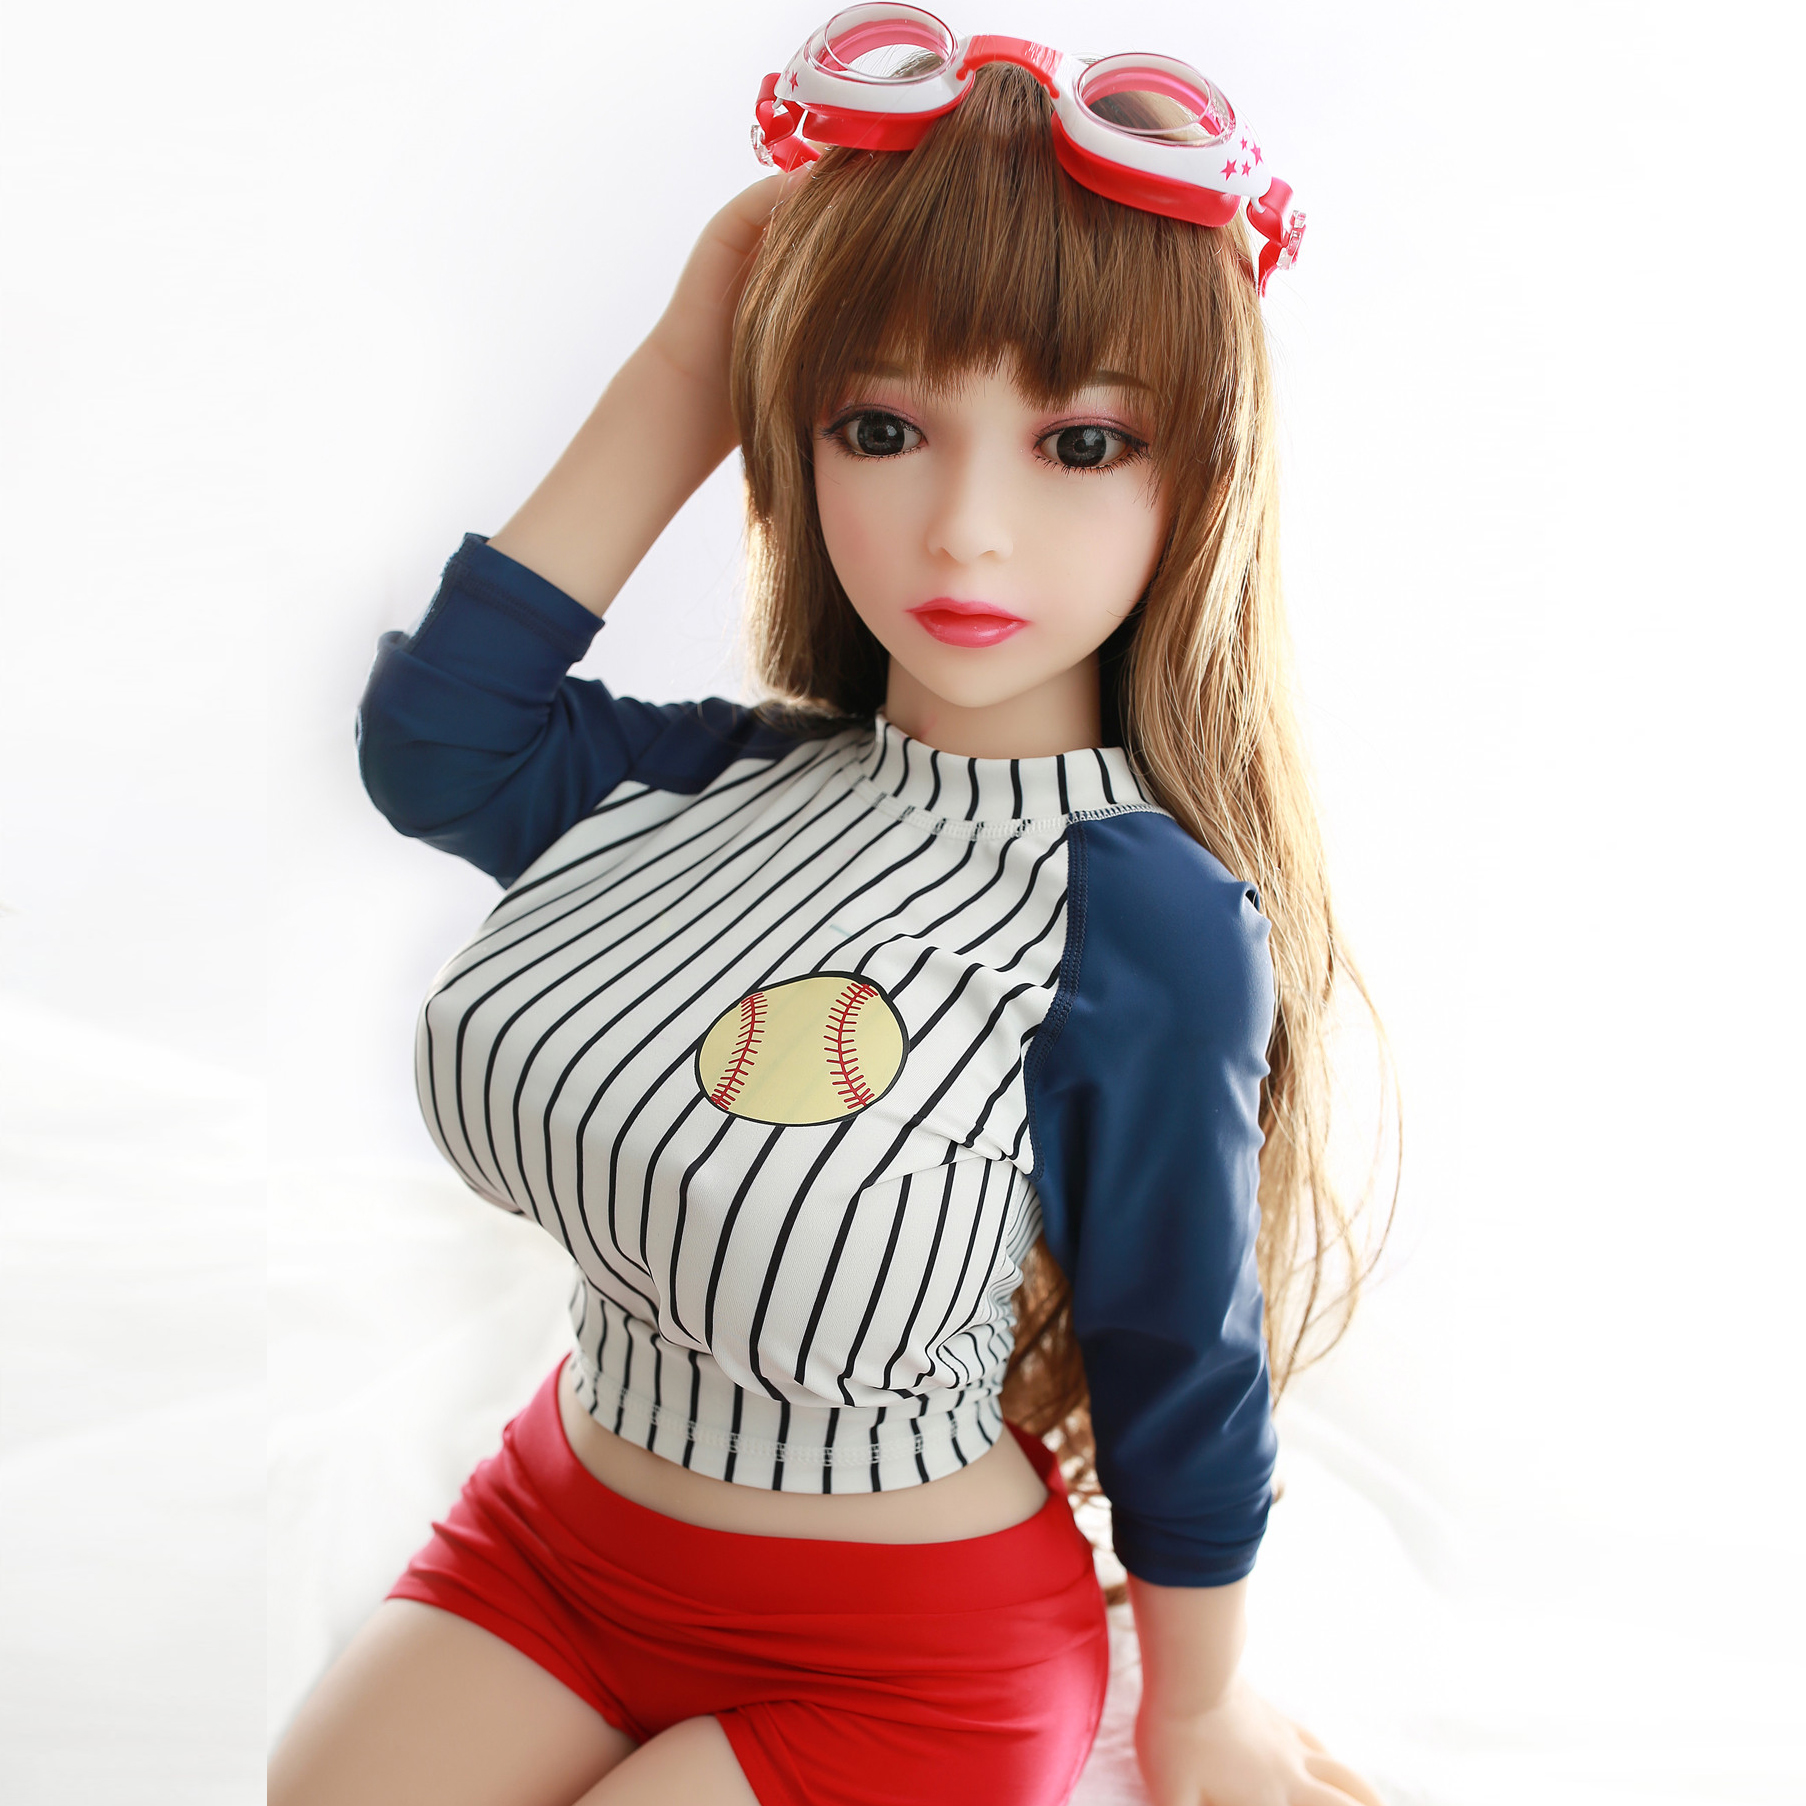 PERSONAGE Love Dolls Silicone Realistic 100cm Sex Doll Boneka Sex Full Body Mini Sexdoll TPE Full Sex Toys for Man